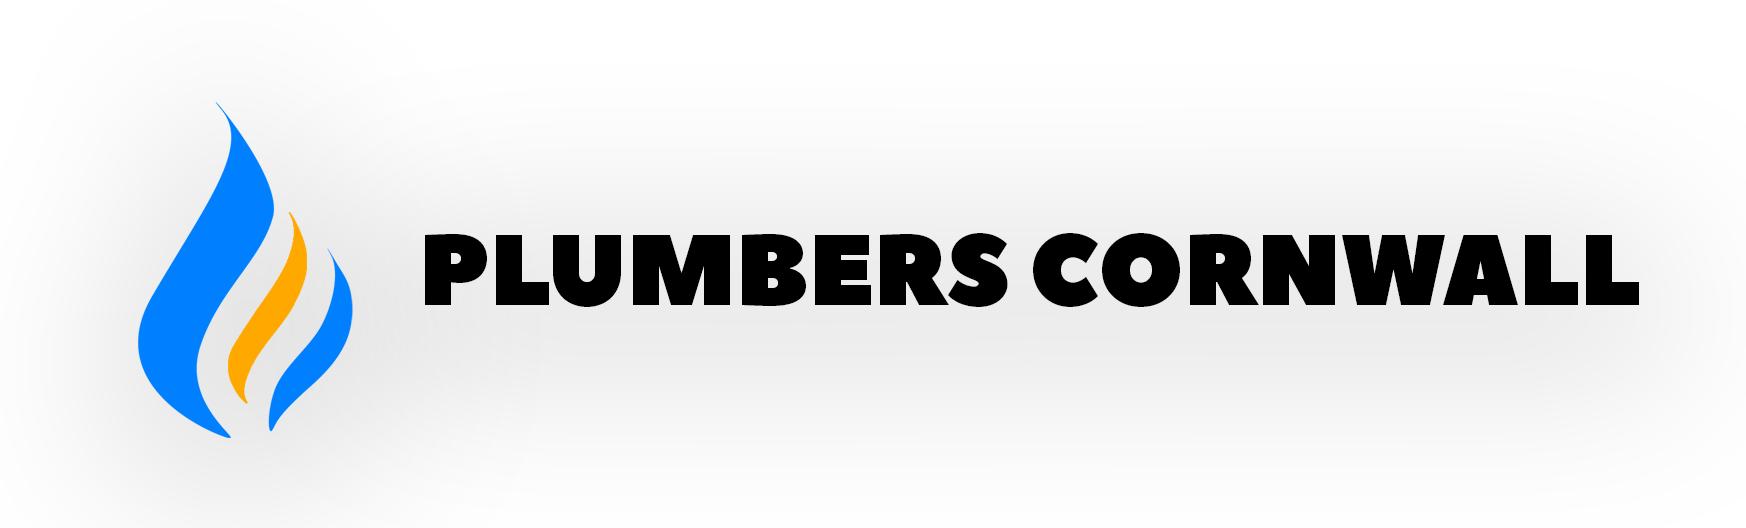 Plumbers Cornwall Logo